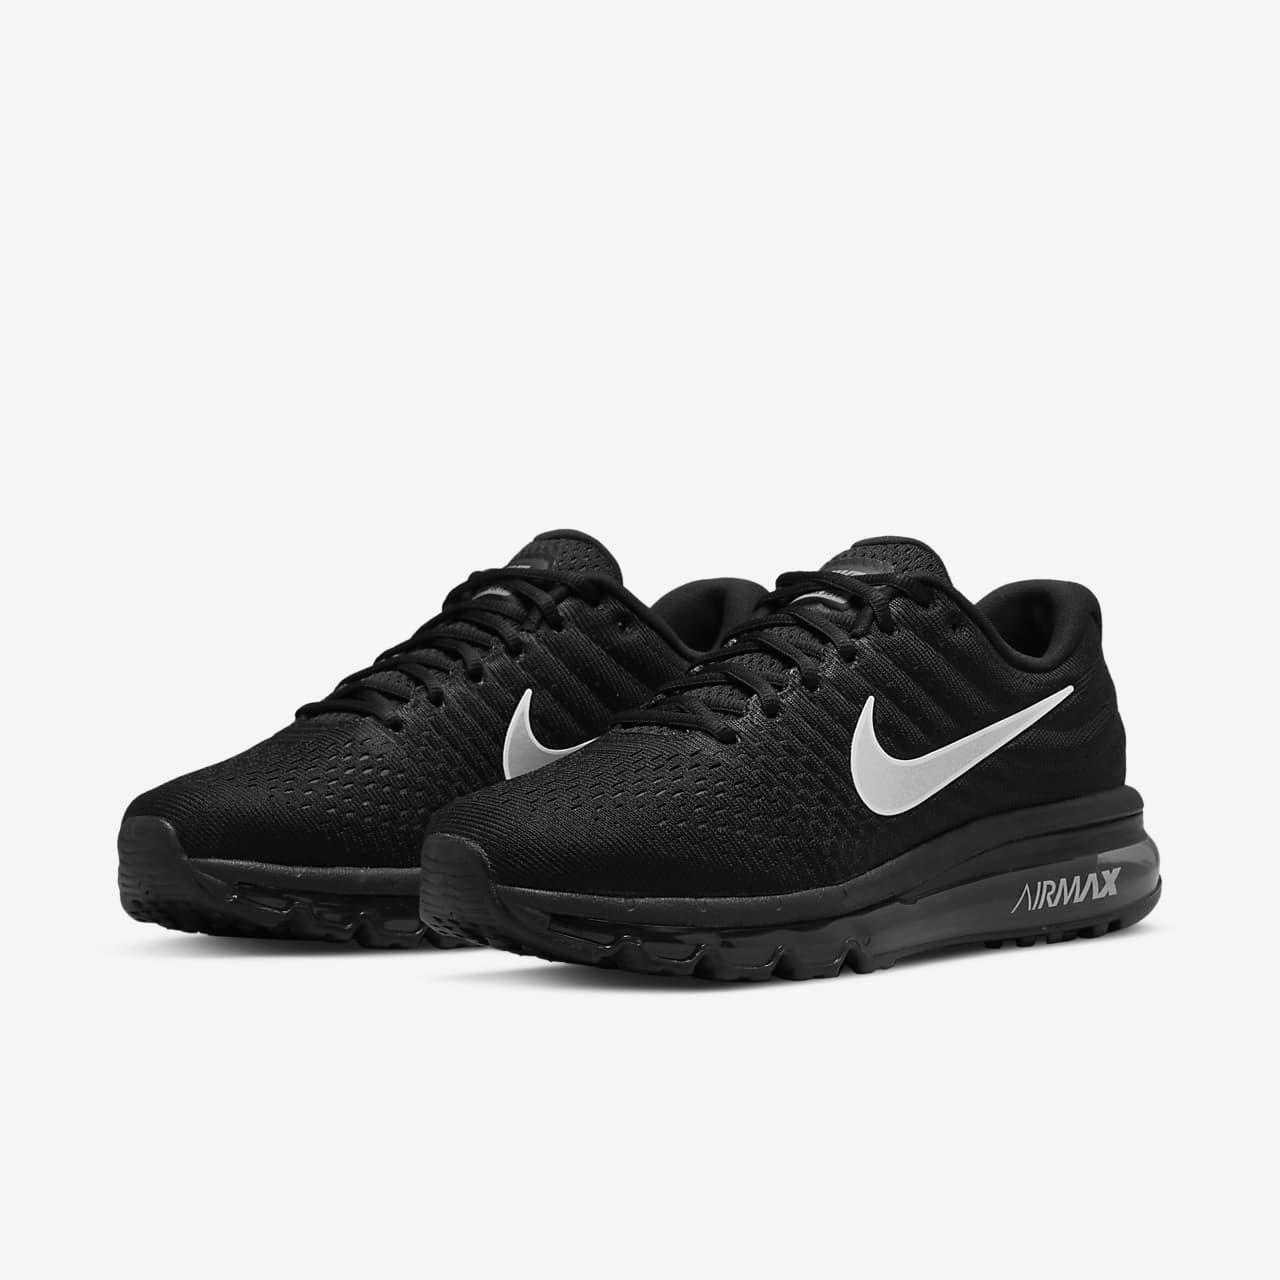 huge discount d65e8 6aac0 ... Calzado para mujer Nike Air Max 2017